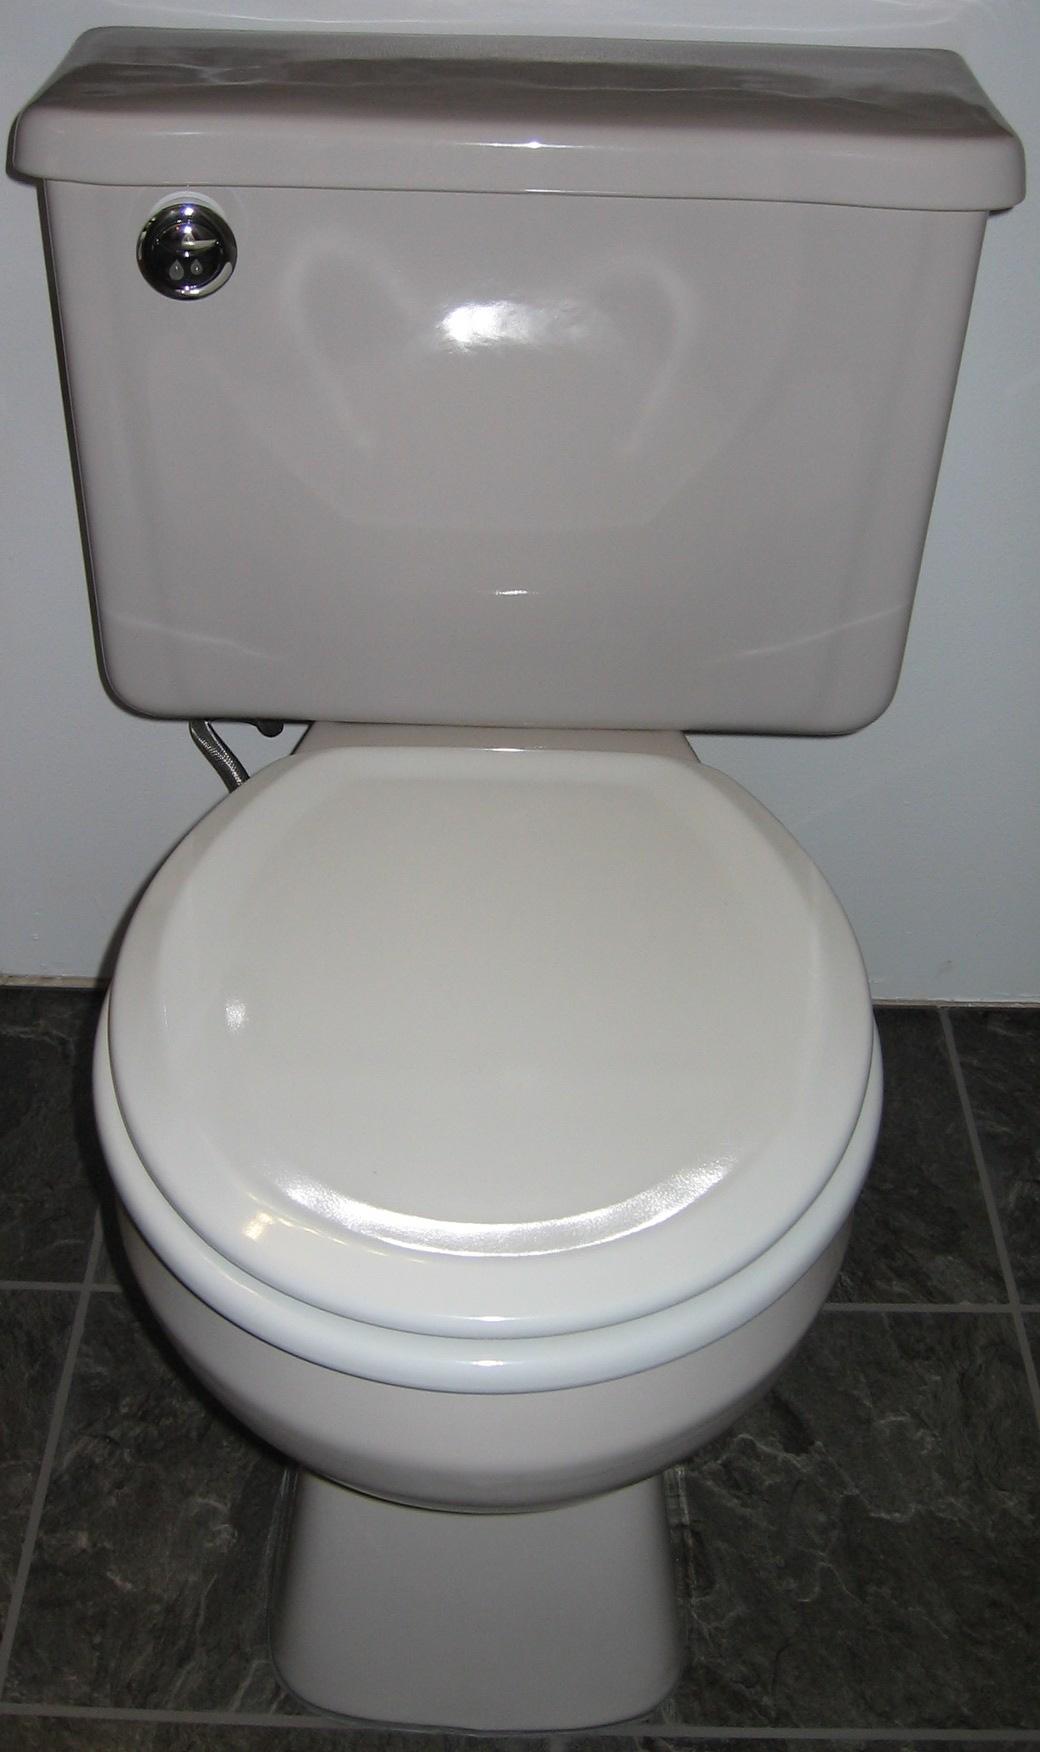 Installation of Dual Flush Converter Kit from Home Depot